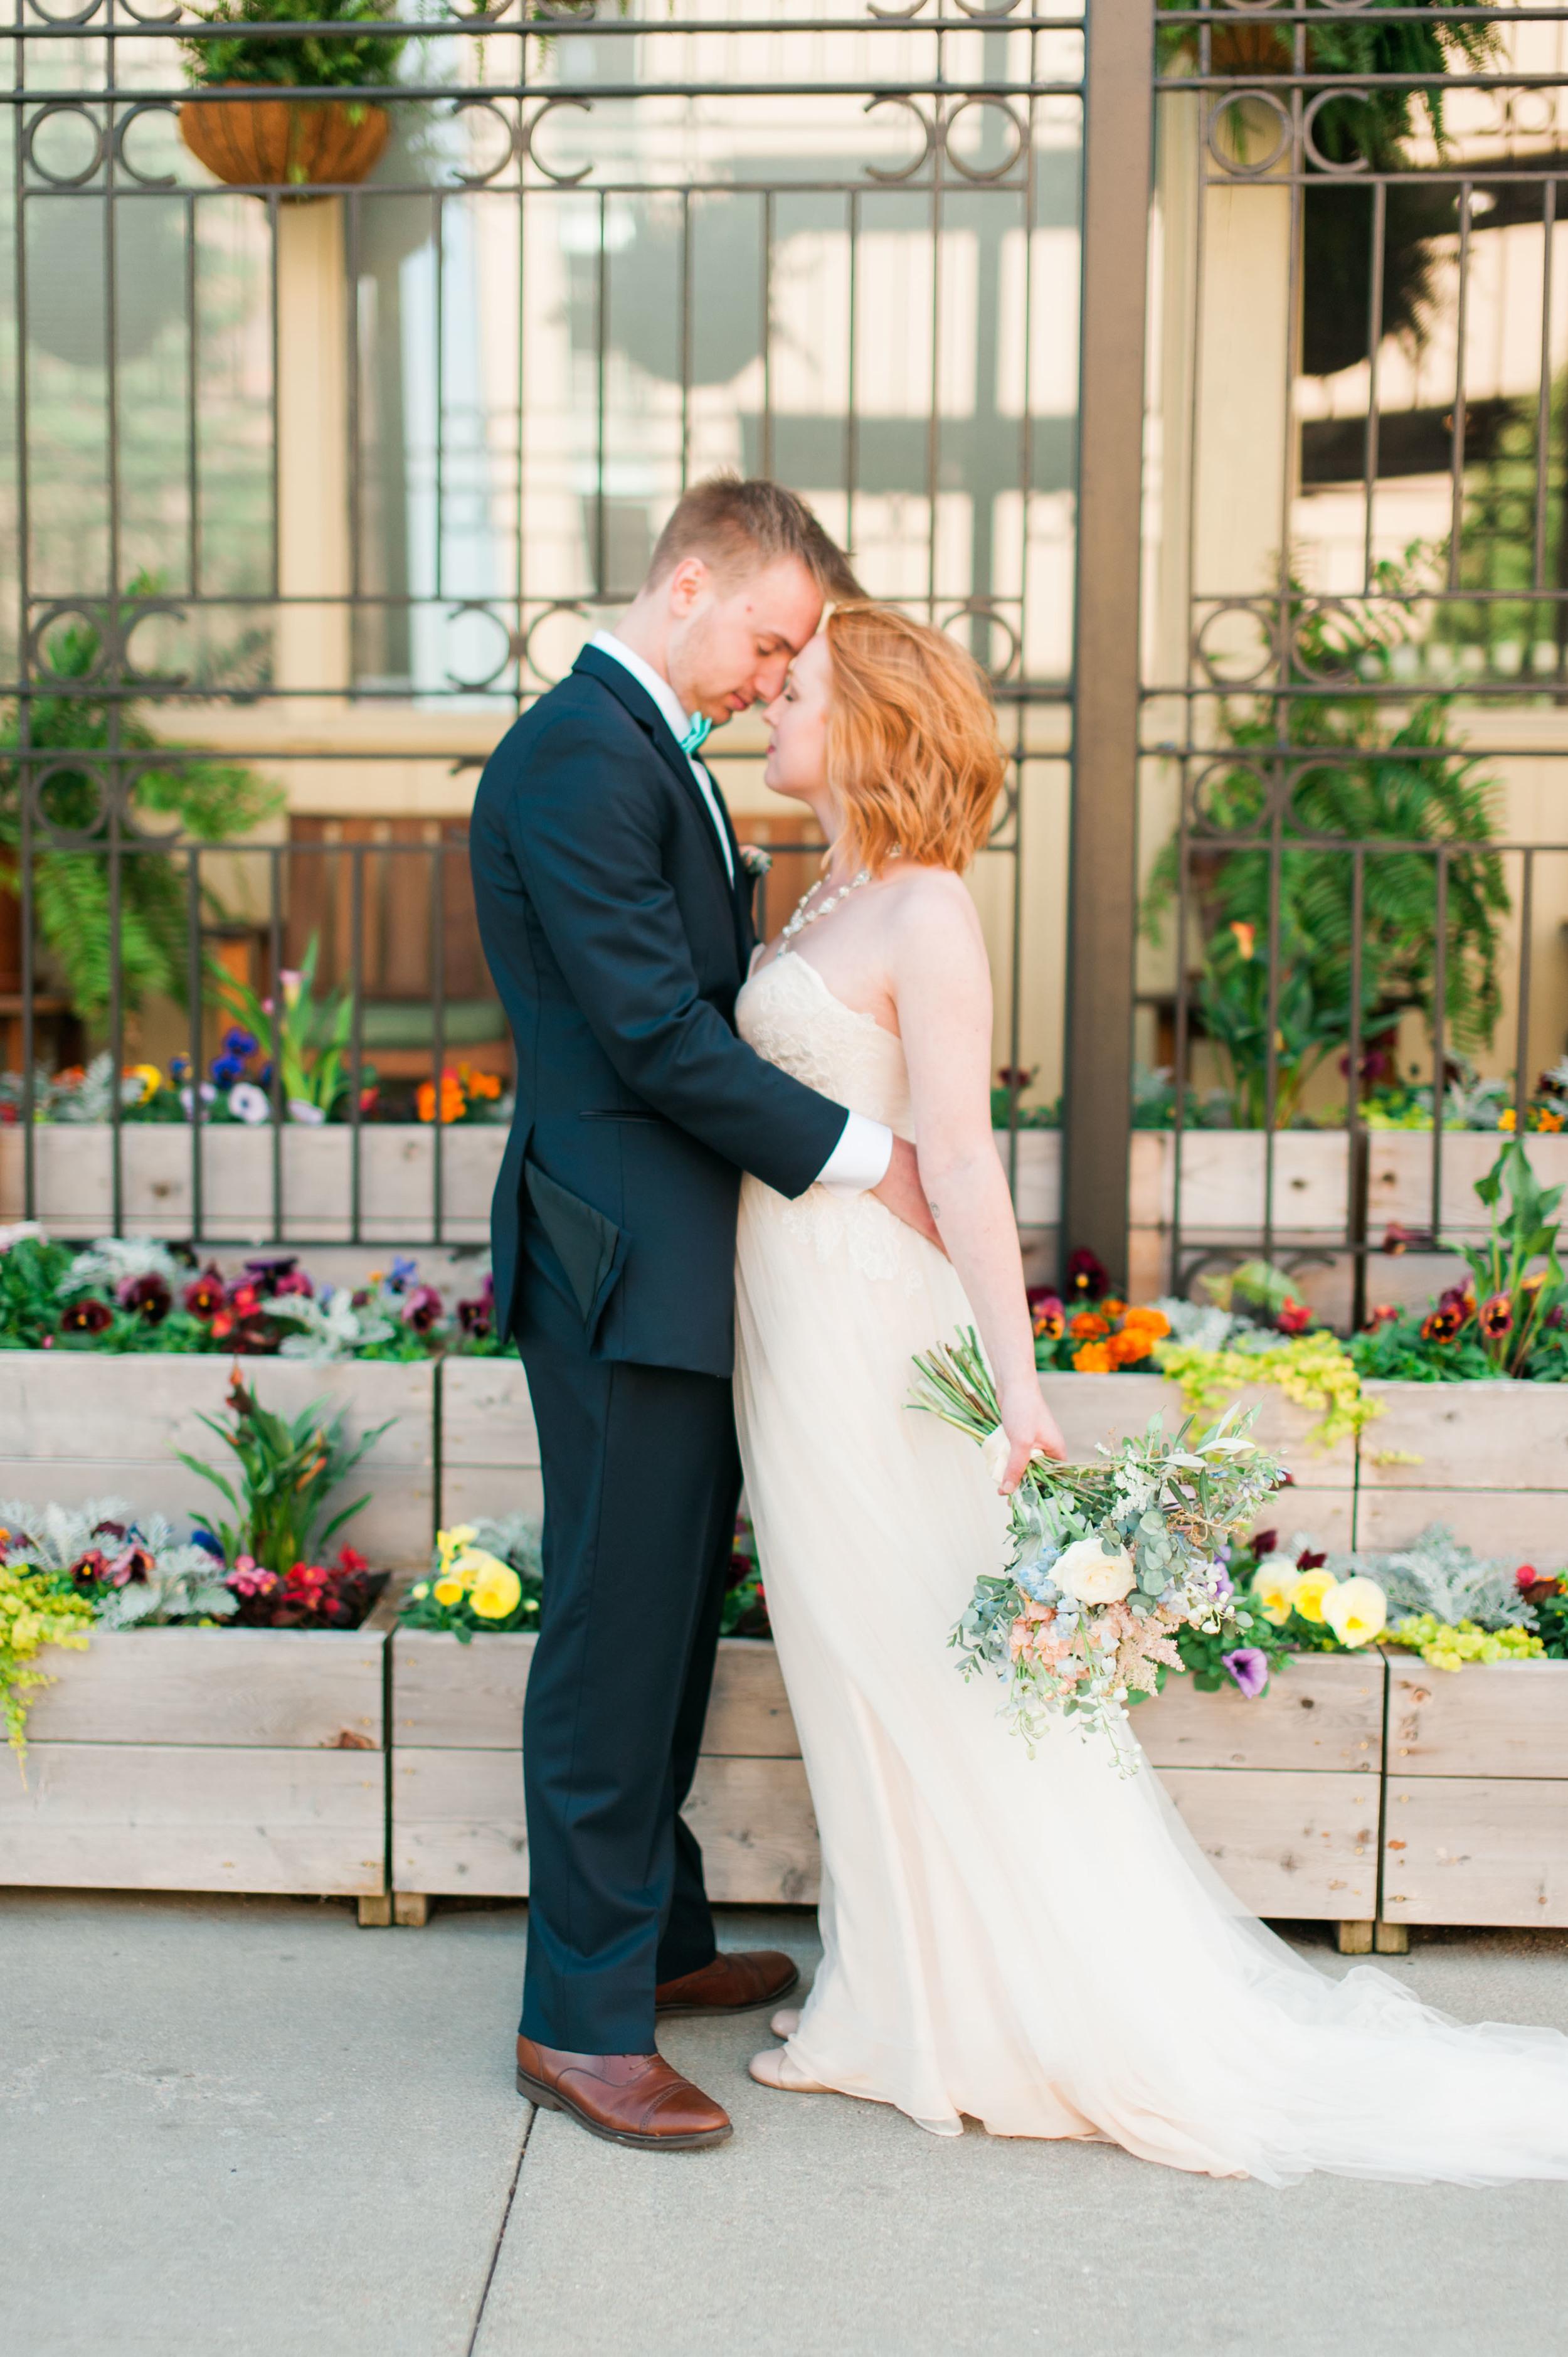 holland-performing-arts-center-wedding-photography-omaha-29.jpg